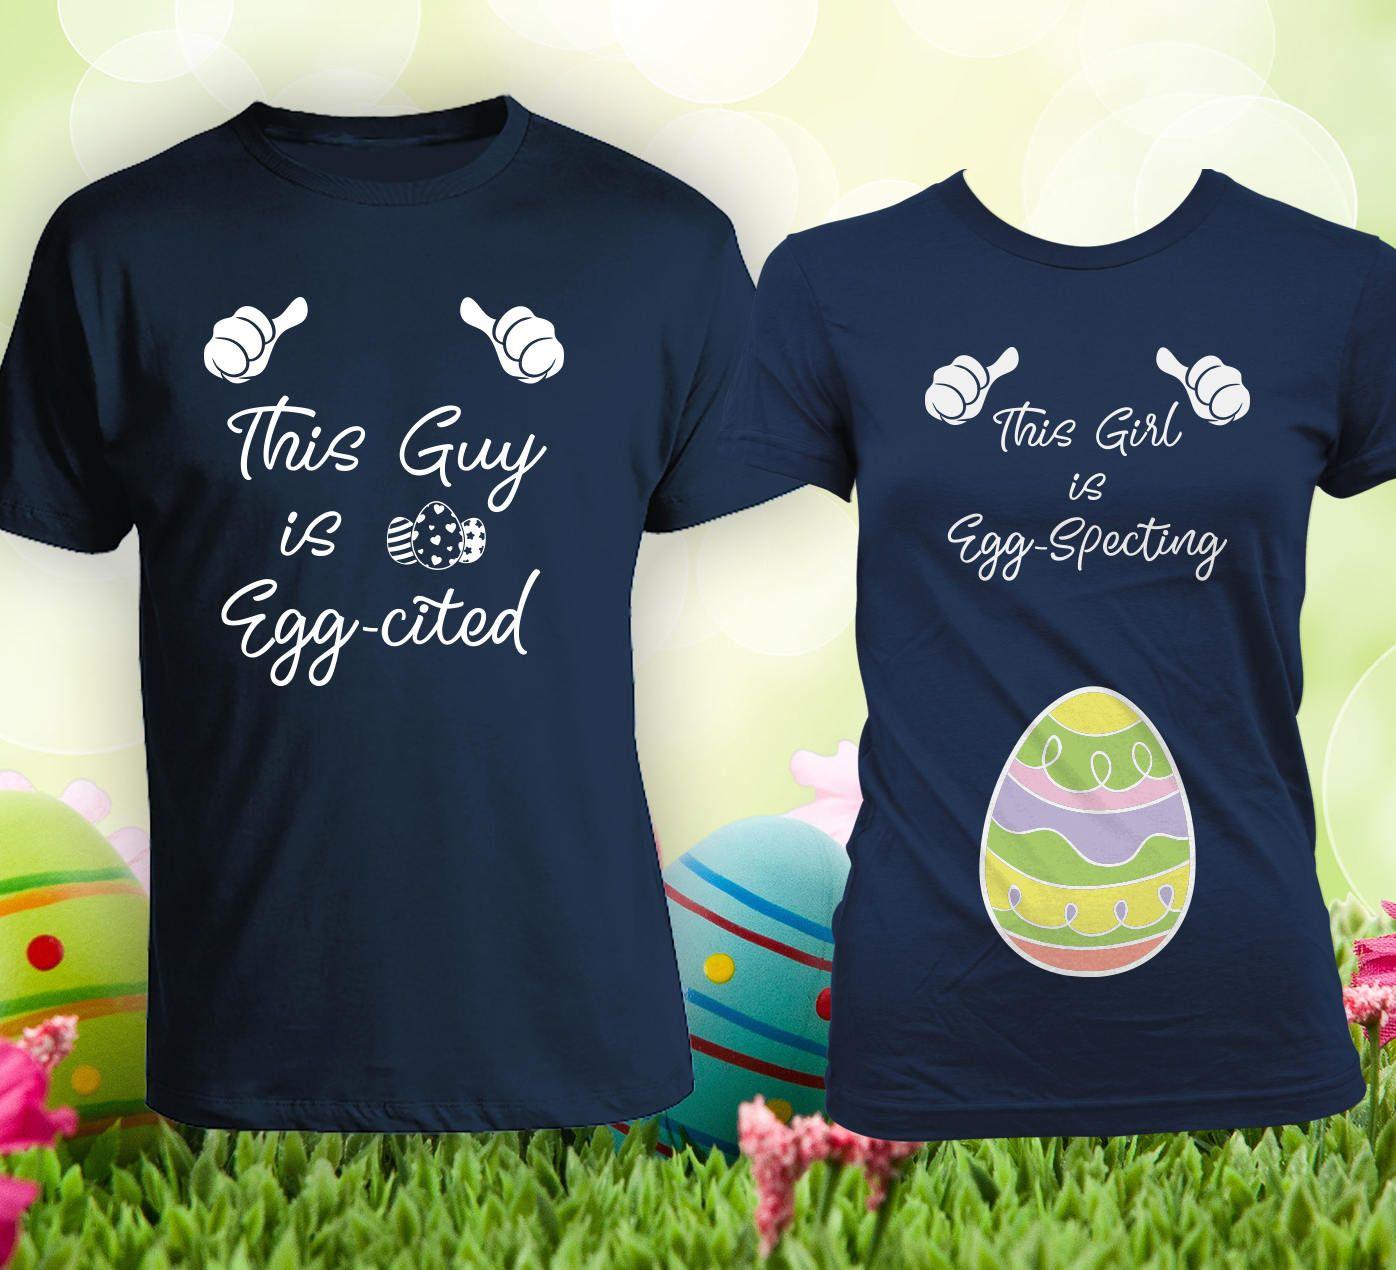 7a3ce82d Easter Pregnancy Announcement Matching Shirts For Couples, Matching Easter  Shirts, Pregnancy Reveal, Happy Easter, Easter shirts CCB-576-577 by ...